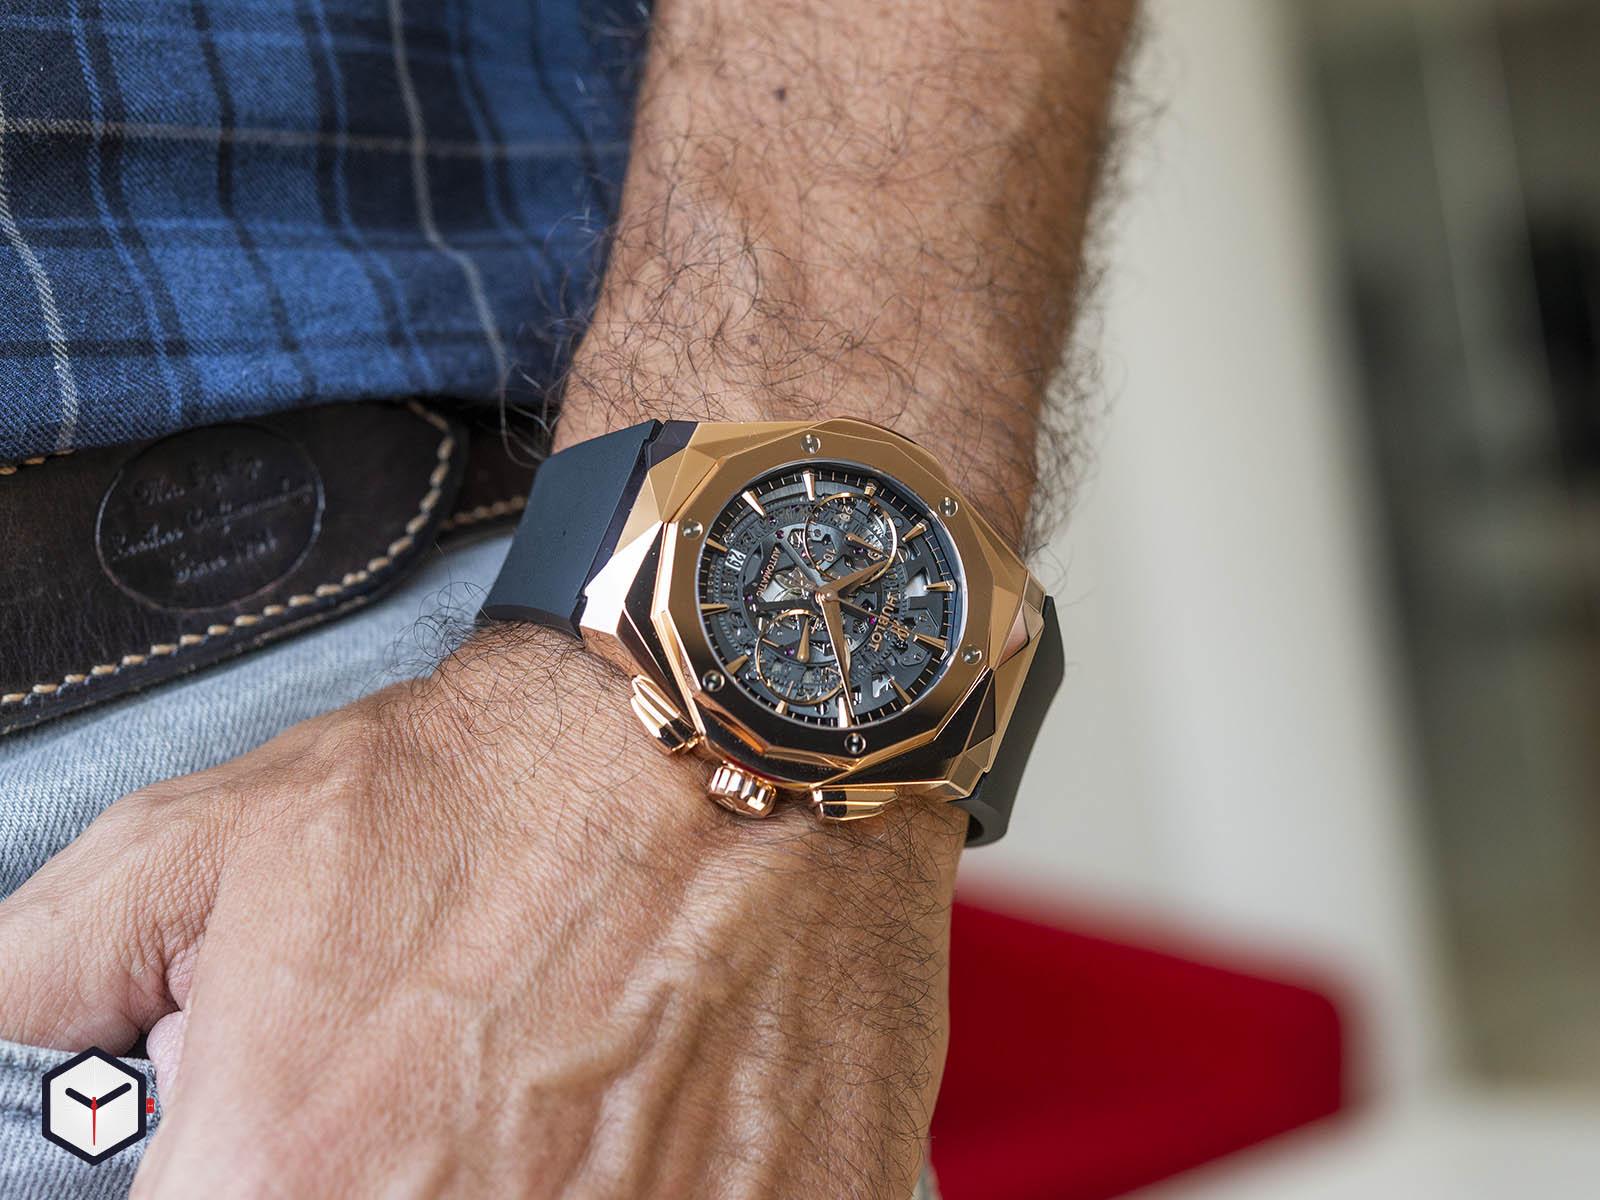 525-ox-0180-rx-orl18-hublot-classic-fusion-aerofusion-chronograph-orlinski-king-gold-8.jpg